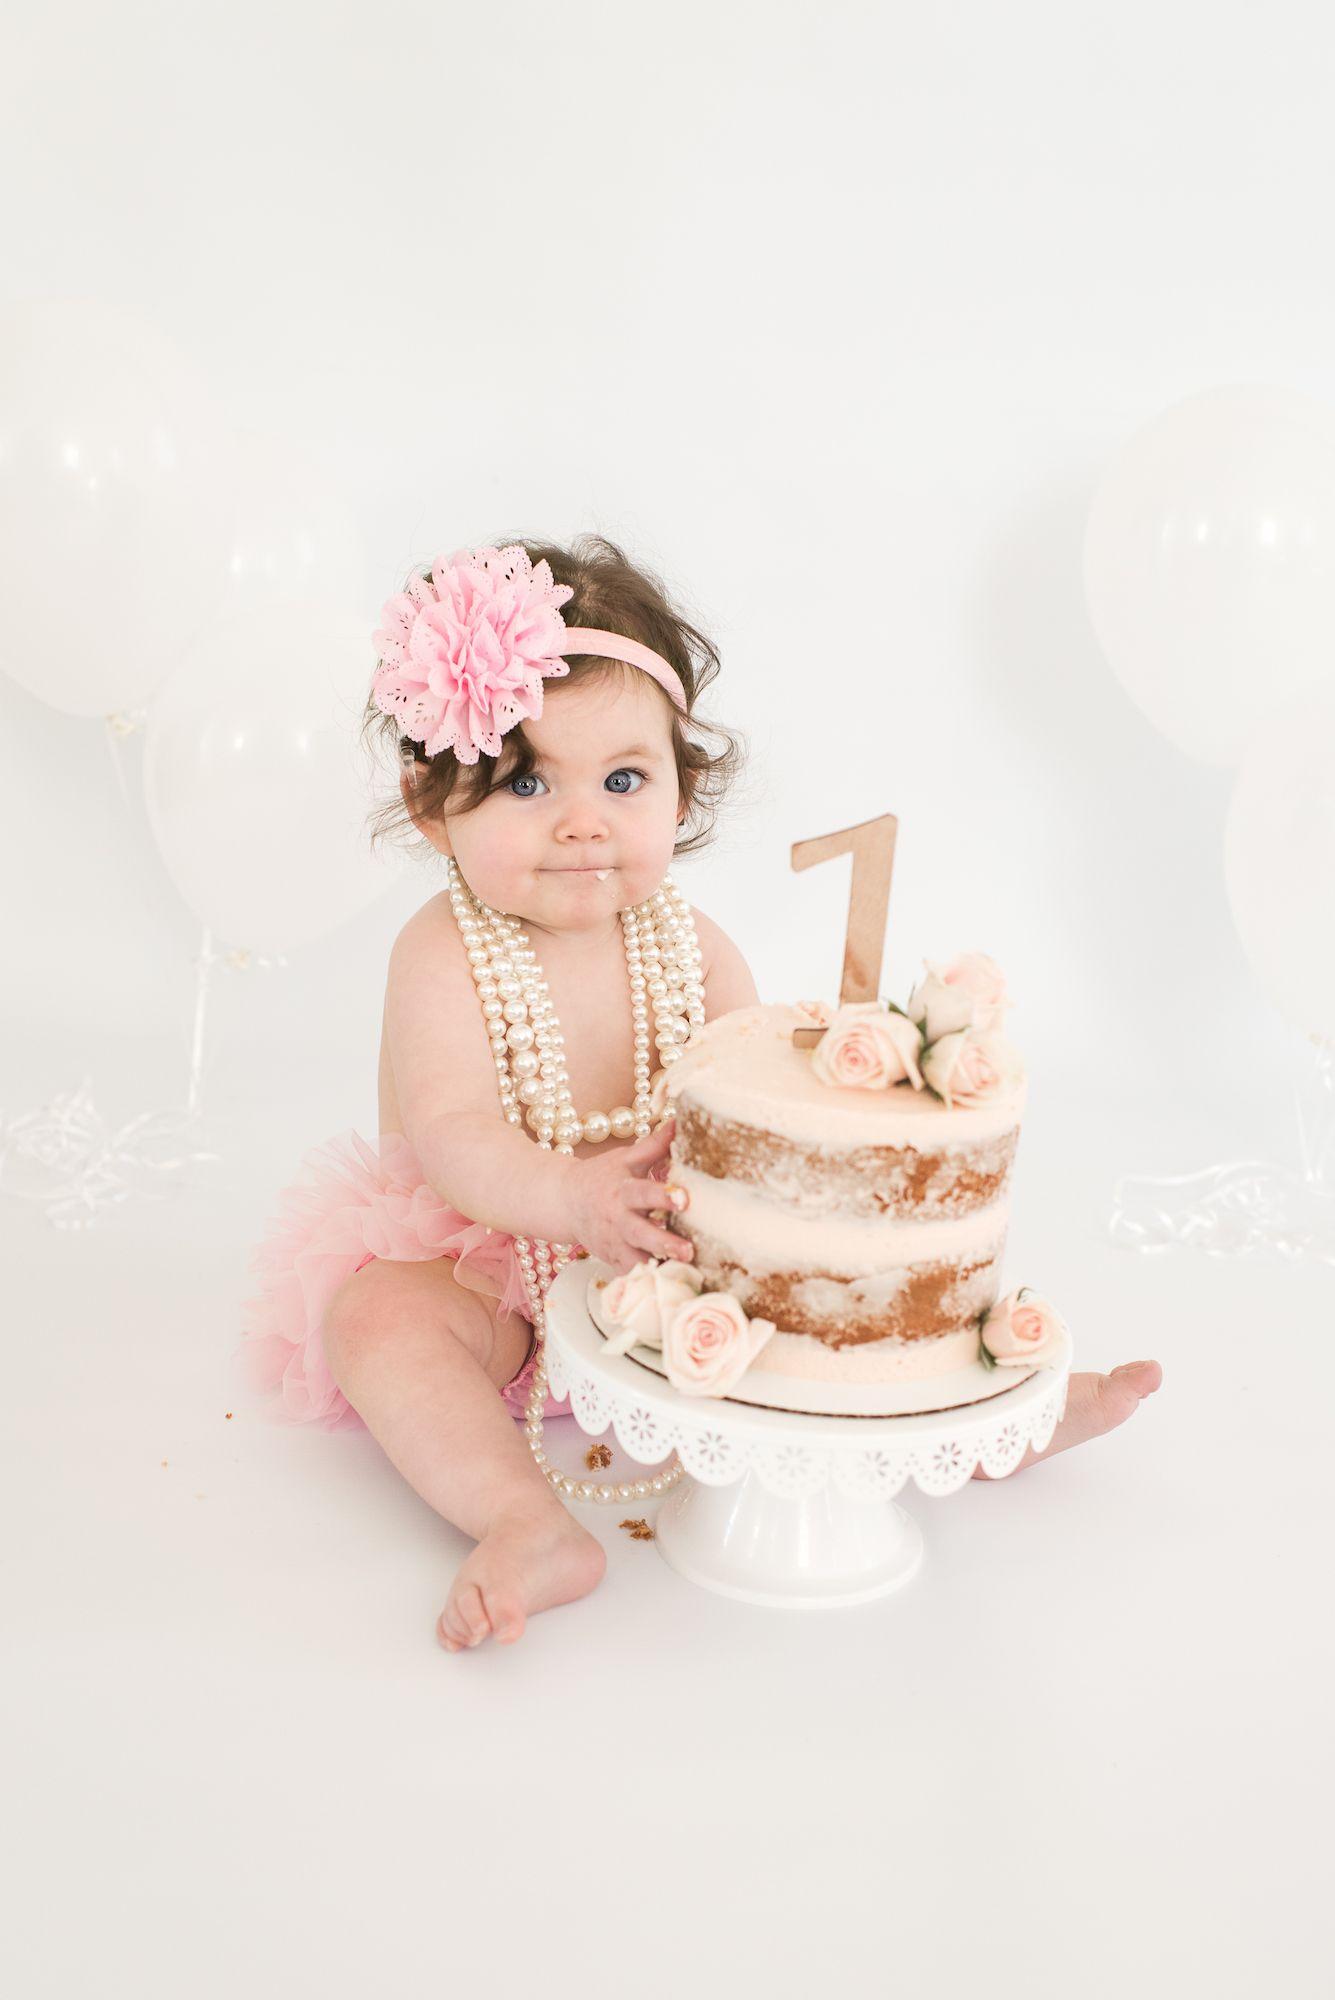 Cake Smash photography session. Centerville Ohio. www